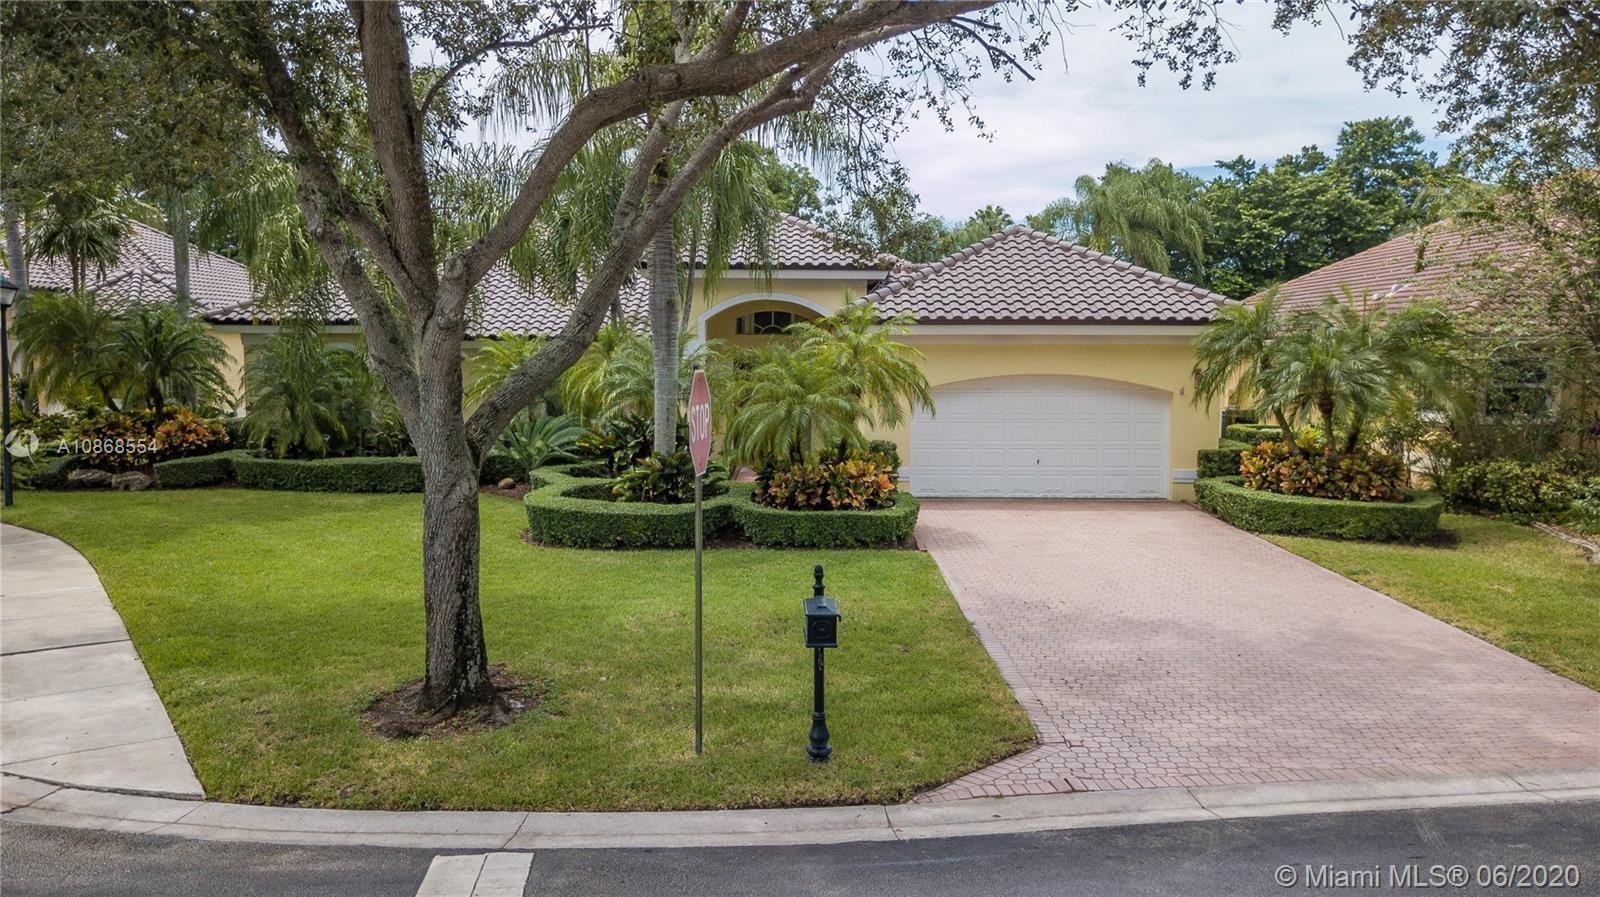 1052 SW 156th Ave, Pembroke Pines, FL 33027 - #: A10868554